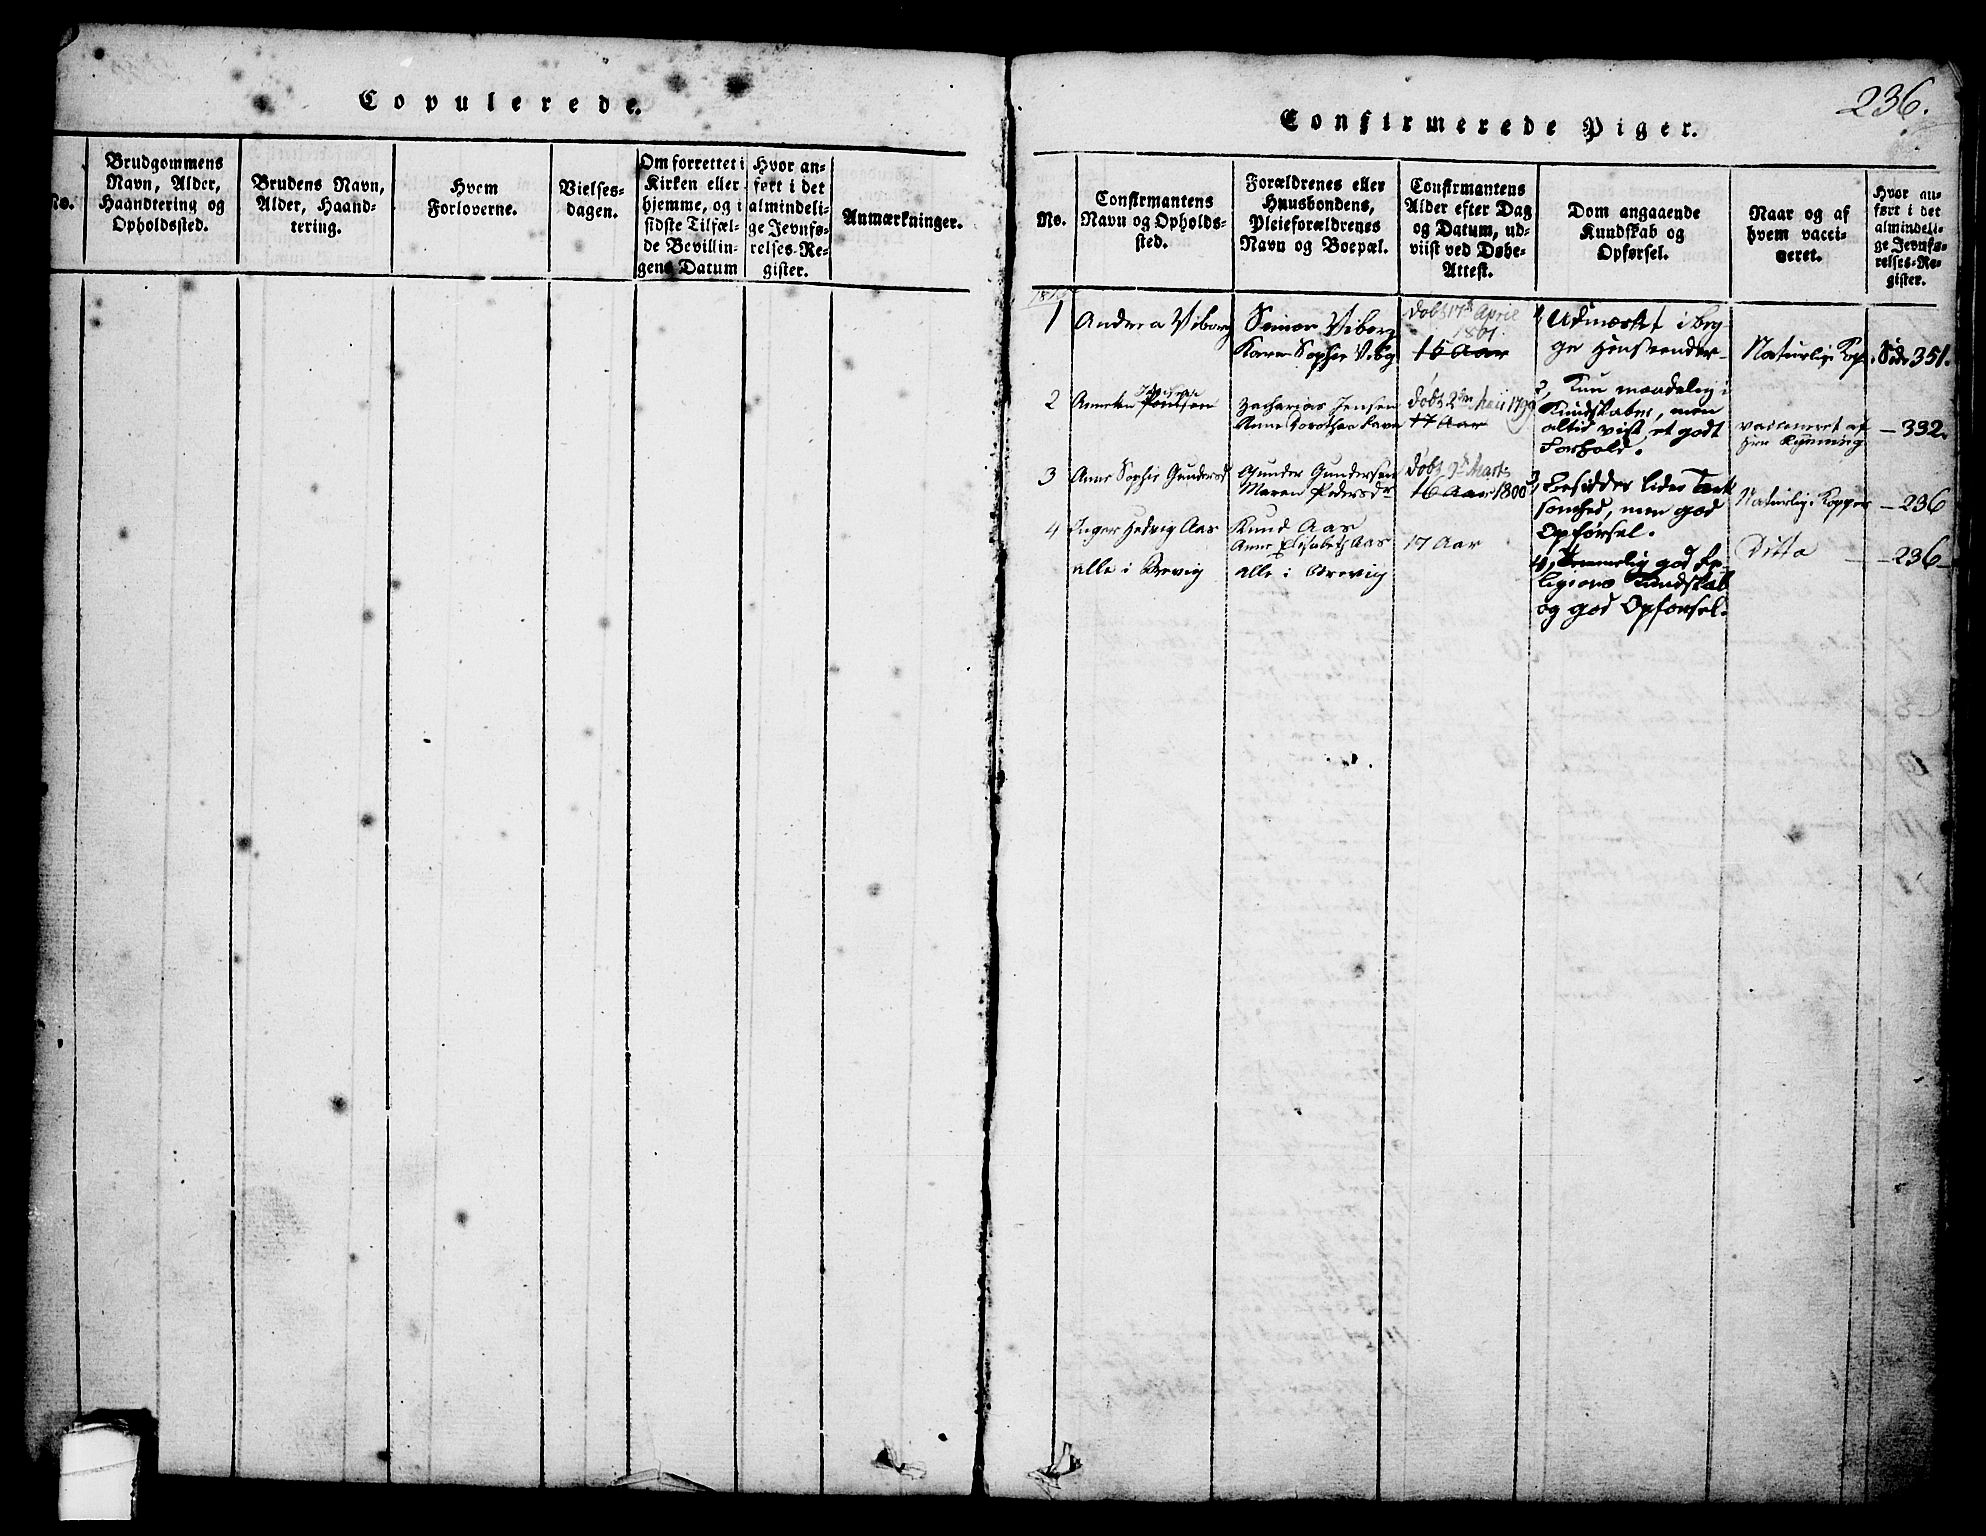 SAKO, Brevik kirkebøker, G/Ga/L0001: Klokkerbok nr. 1, 1814-1845, s. 236